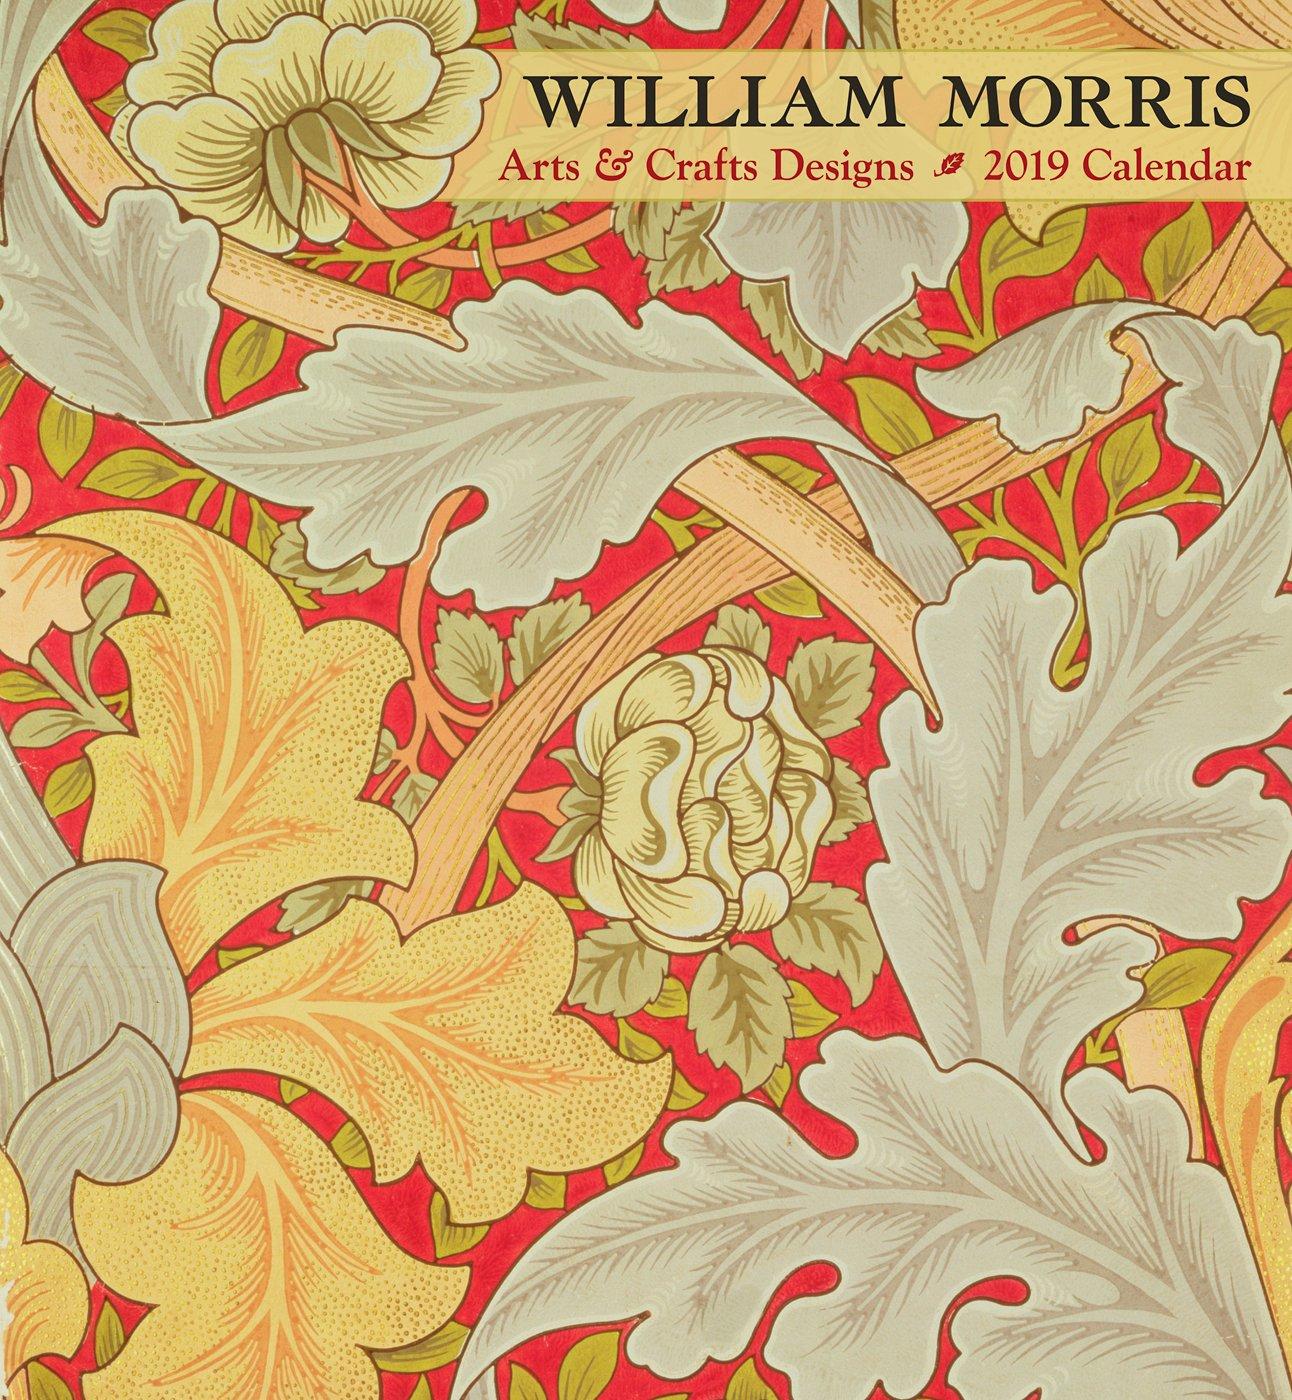 William Morris Arts Crafts Designs 2019 Wall Calendar